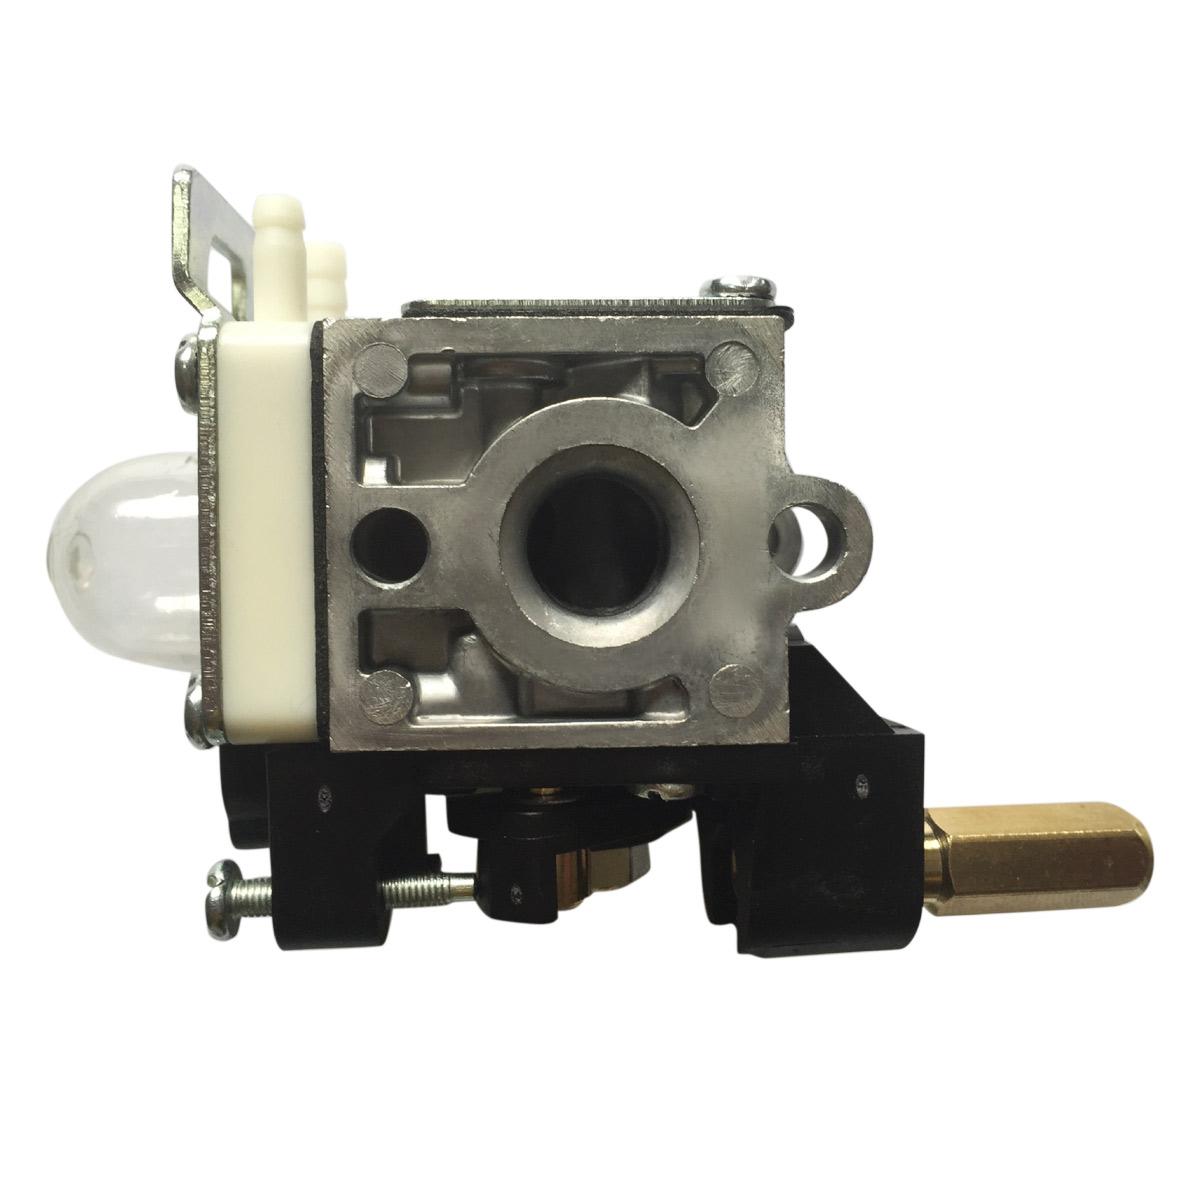 Carburetor Carb For Type RB-K75 HC-200 SRM-210 SRM-211 PE-200 PPF-211